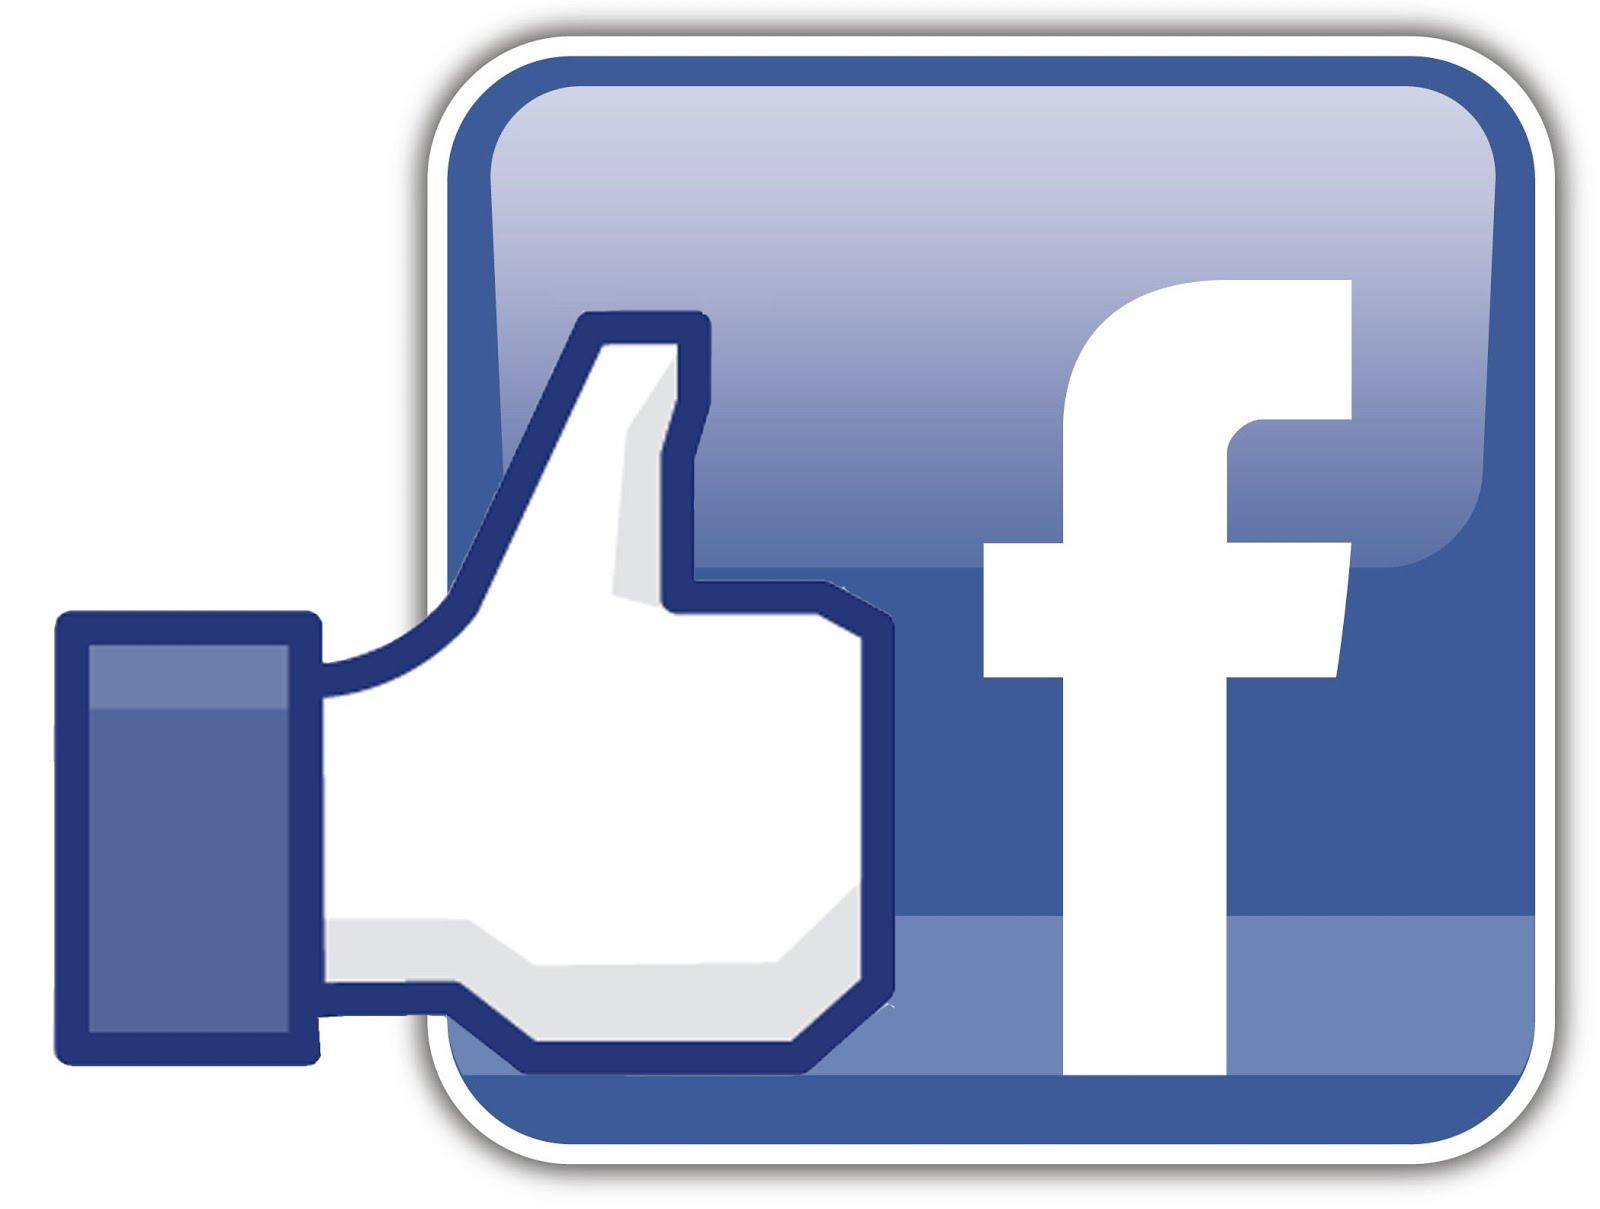 facebook-20like-20logo.jpg